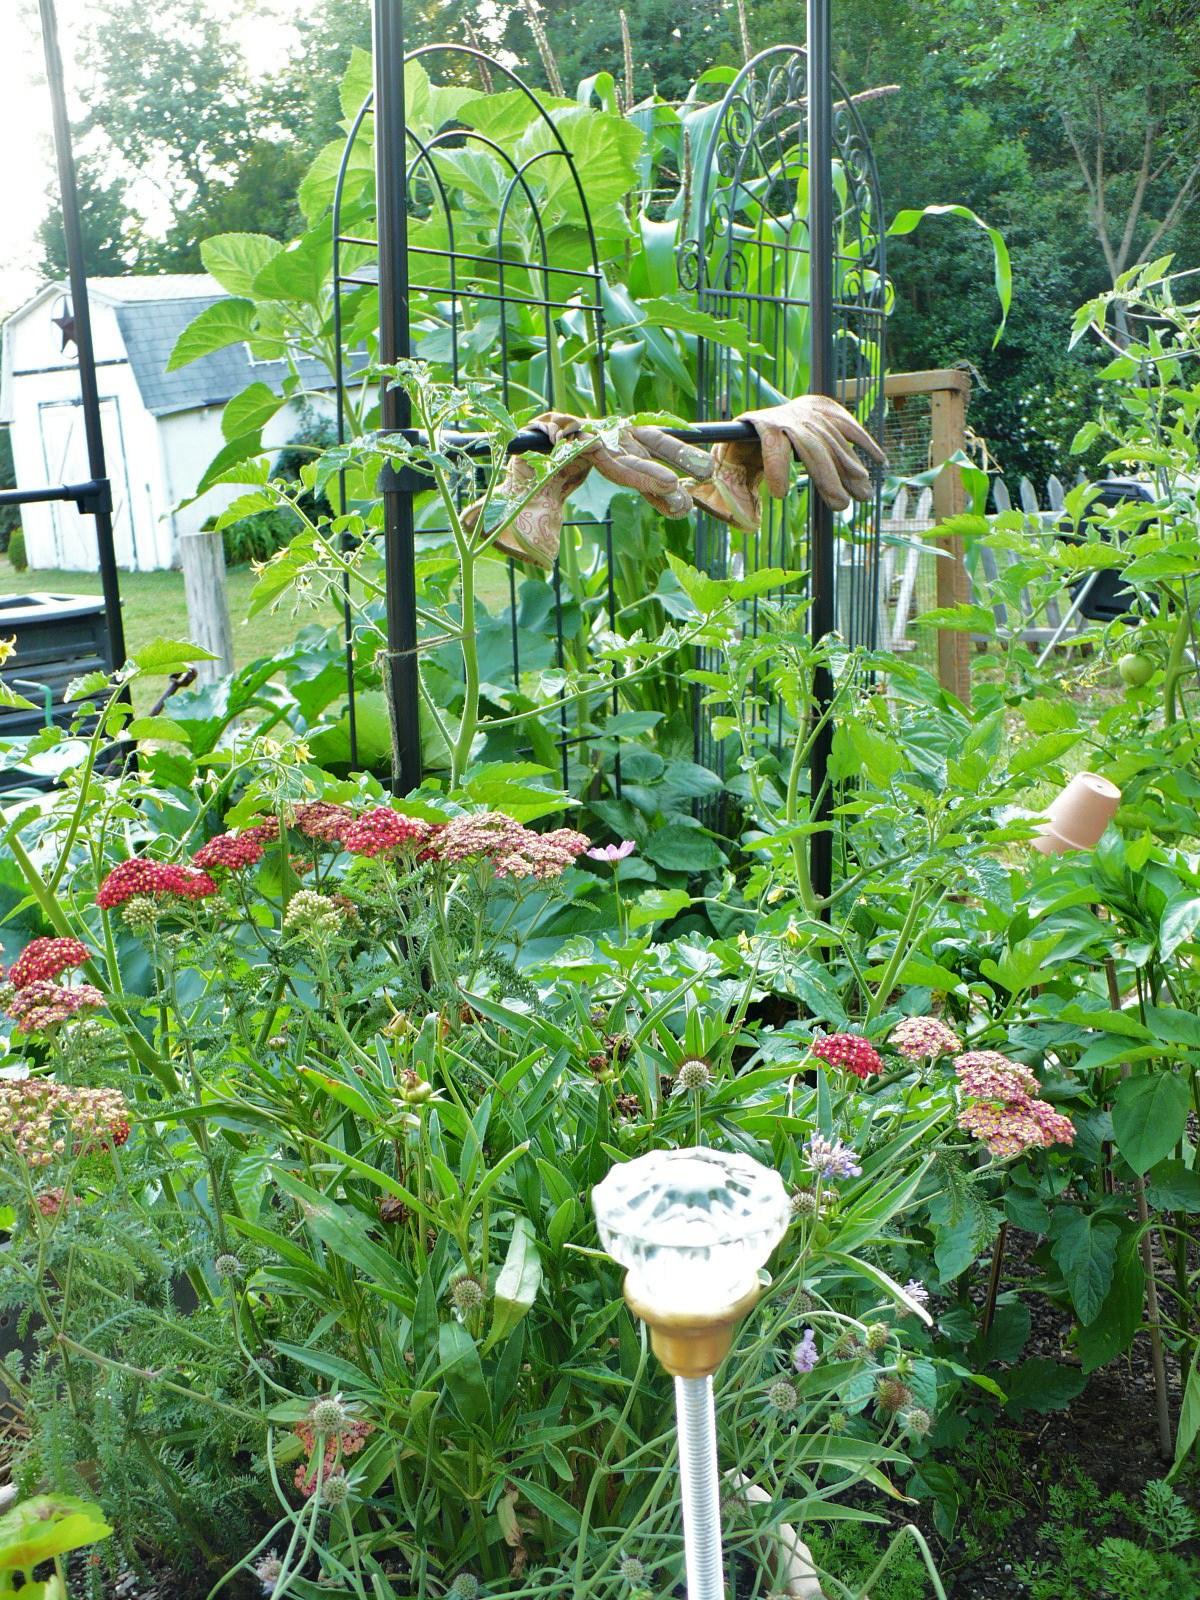 Blinged DIY Garden Hose Guides